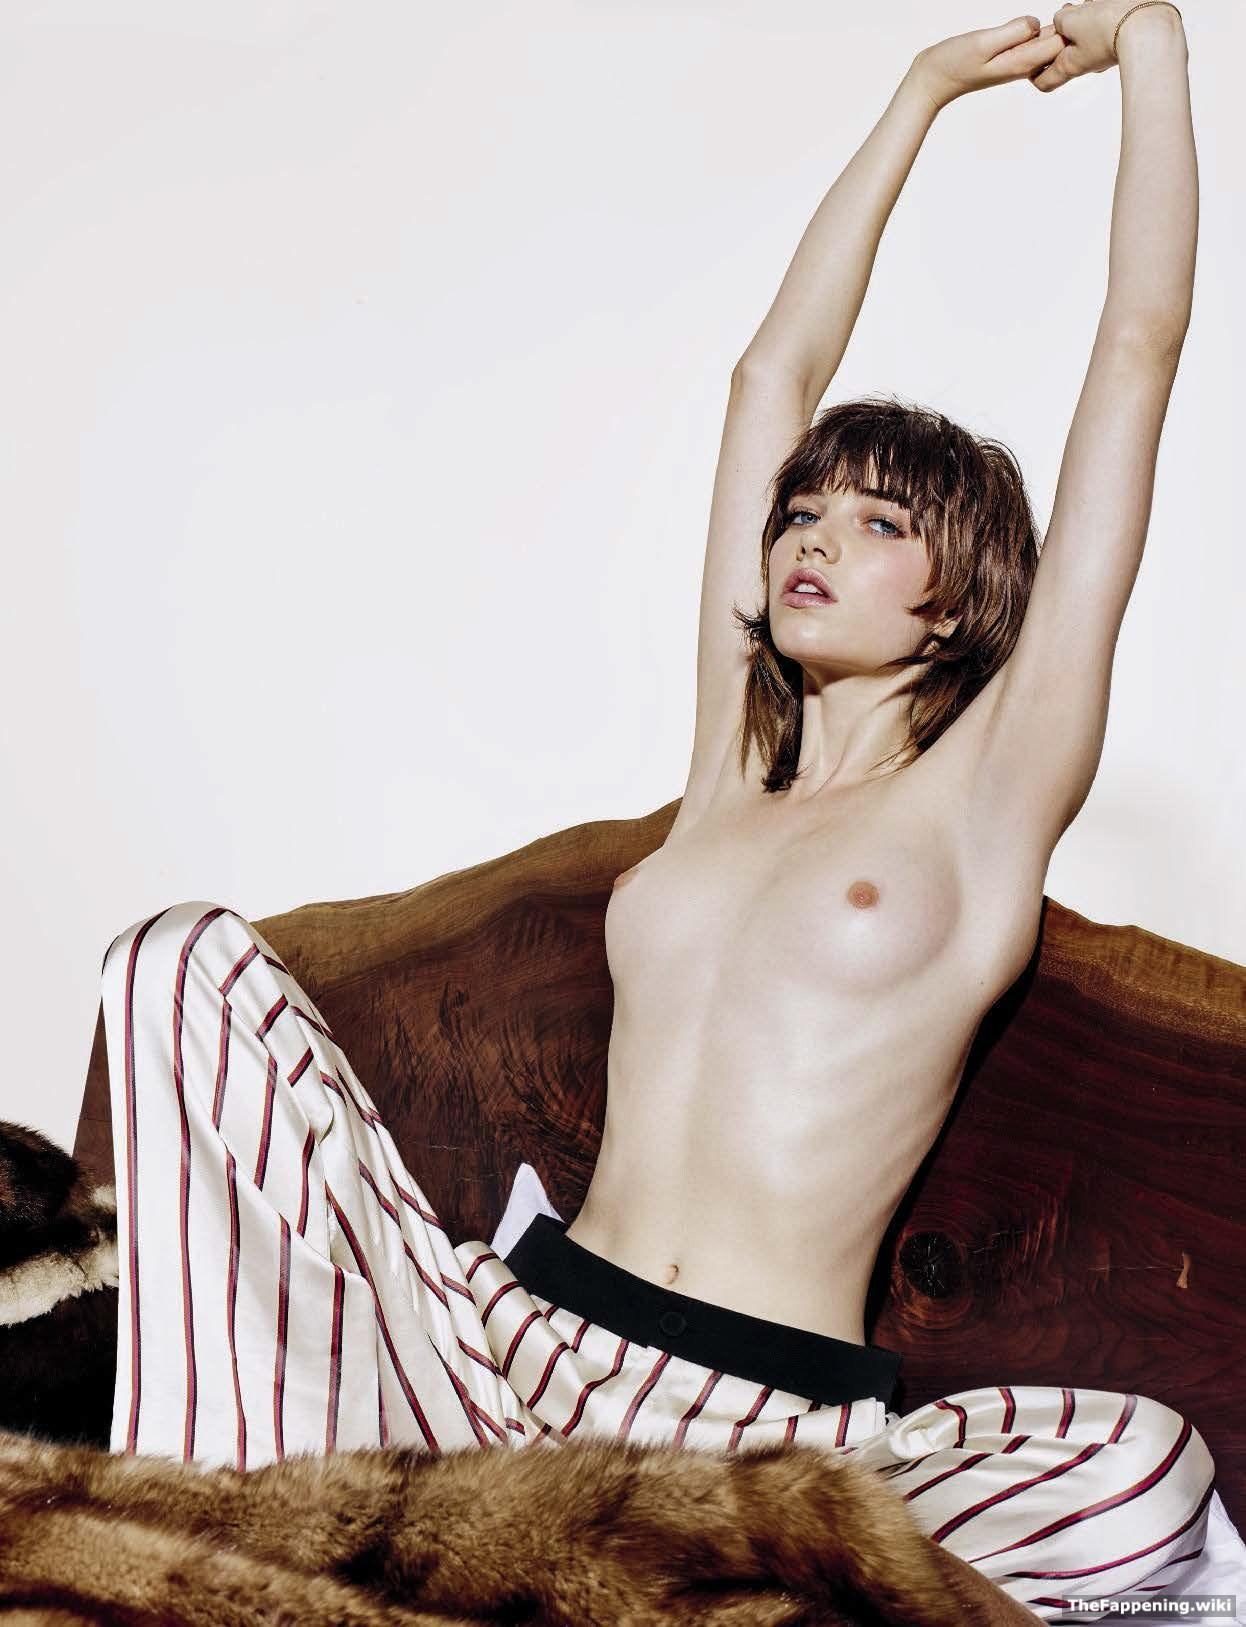 XXX Grace Hartzel nudes (29 foto and video), Topless, Leaked, Boobs, bra 2015